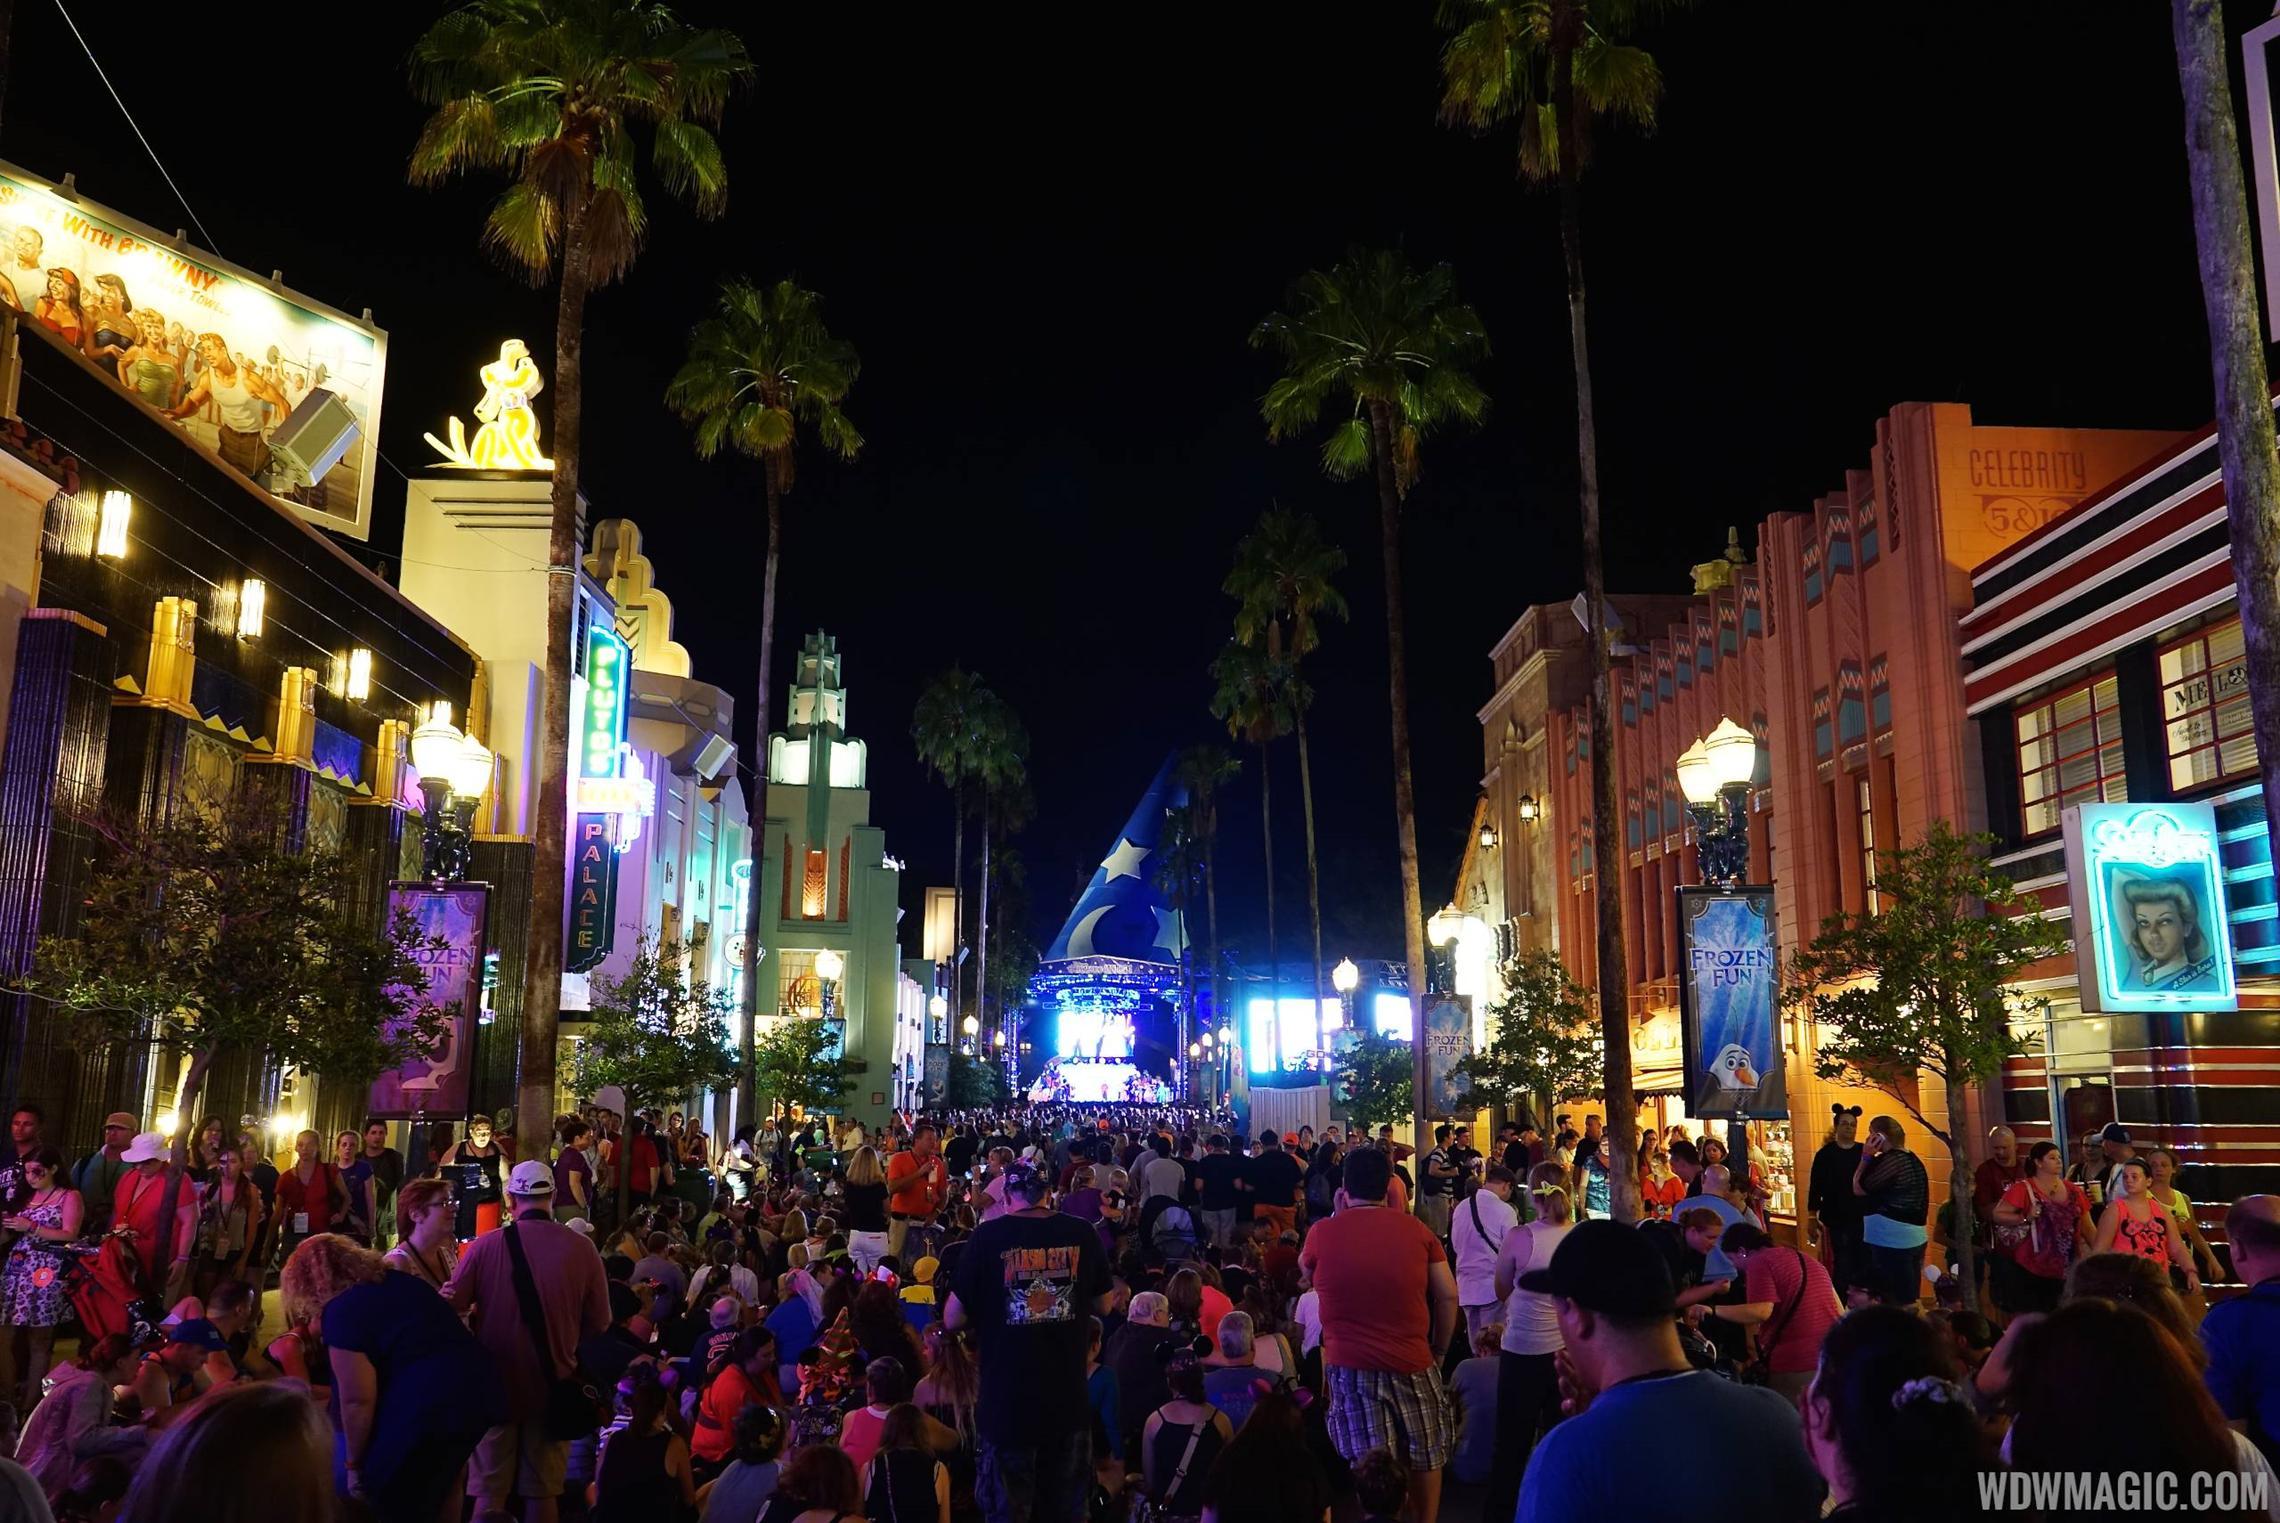 Villains Unleashed - Hollywood Blvd crowds